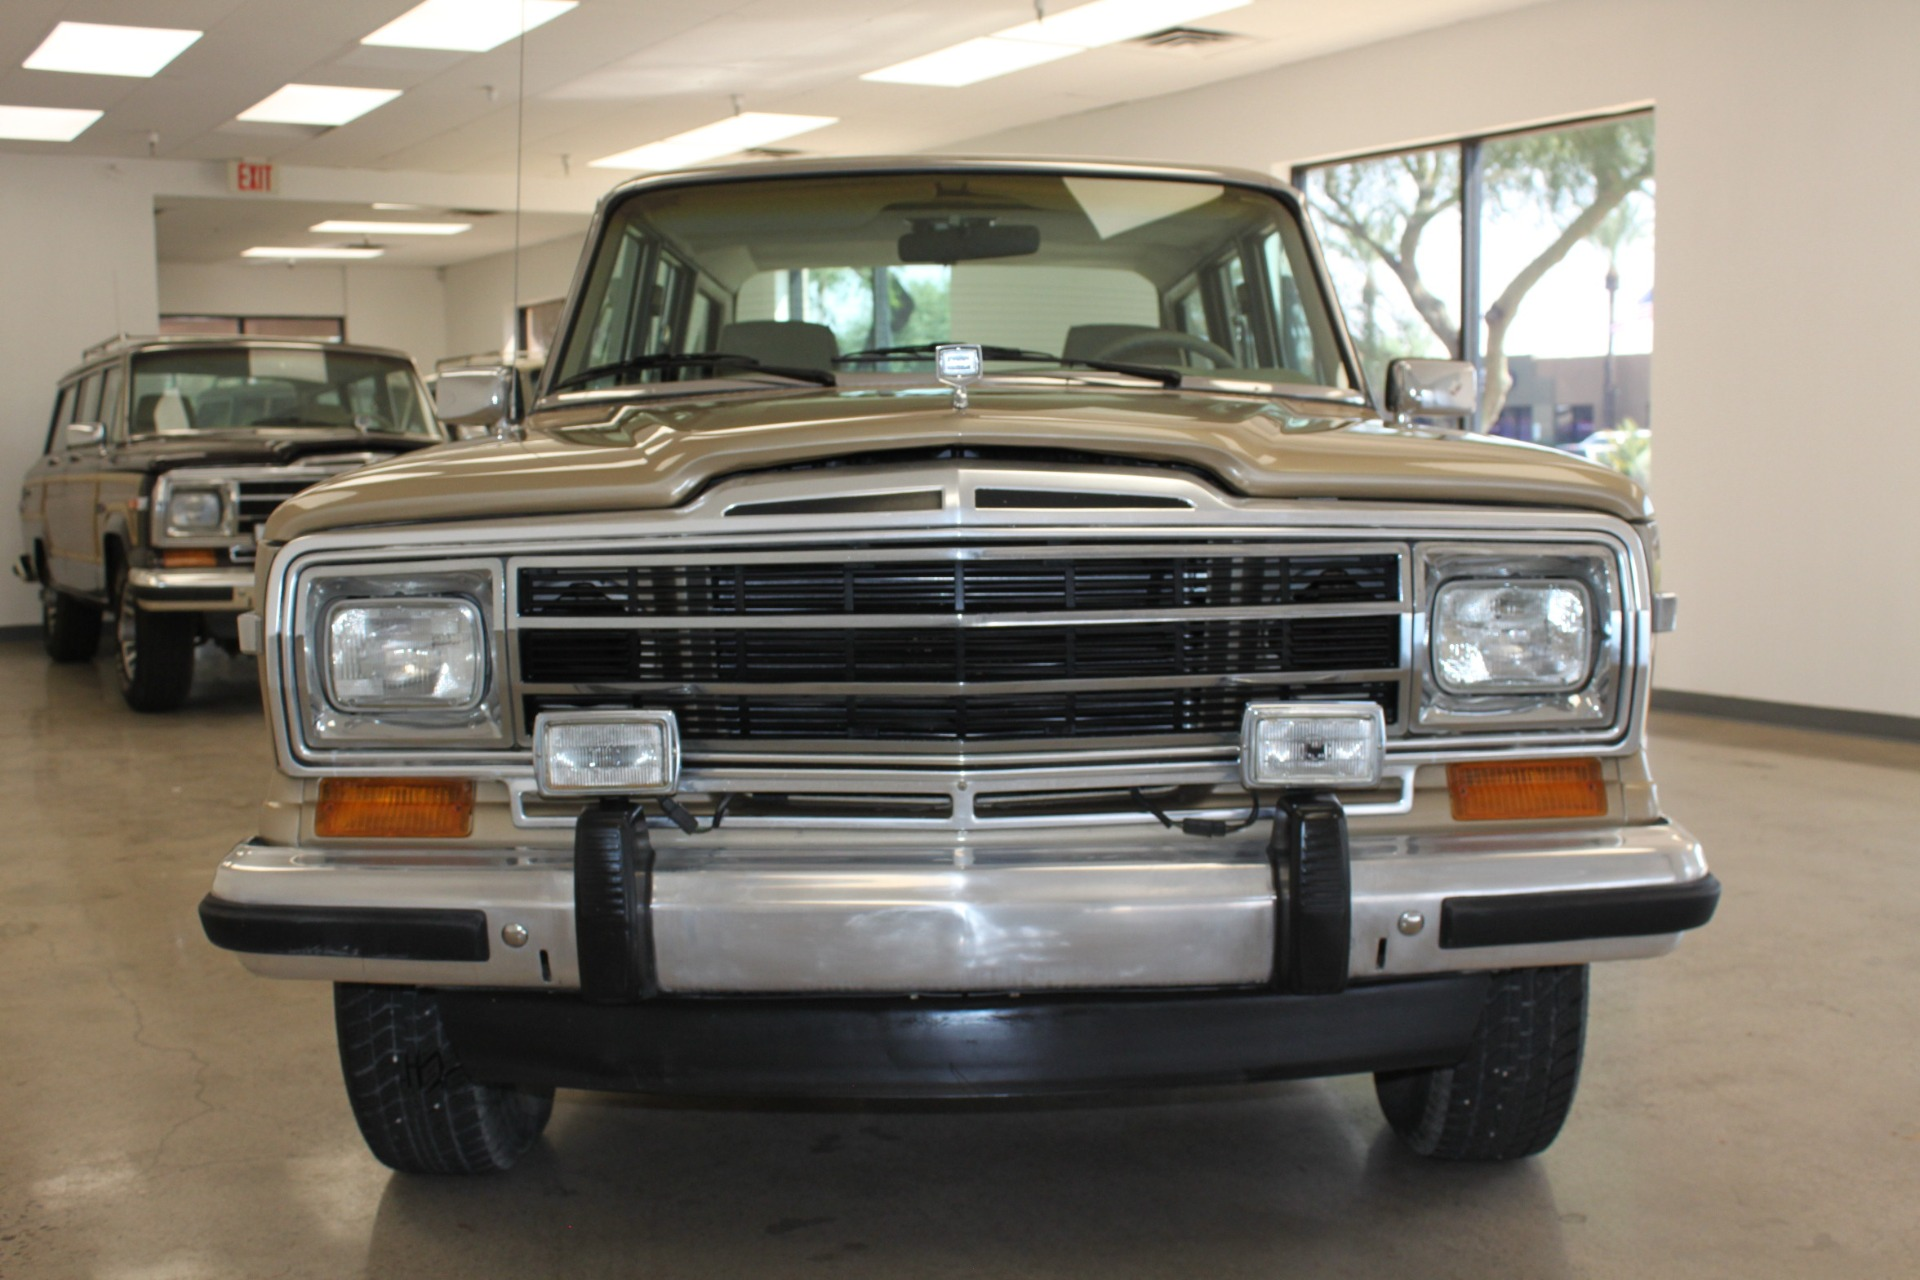 Used-1990-Jeep-Grand-Wagoneer-Wrangler